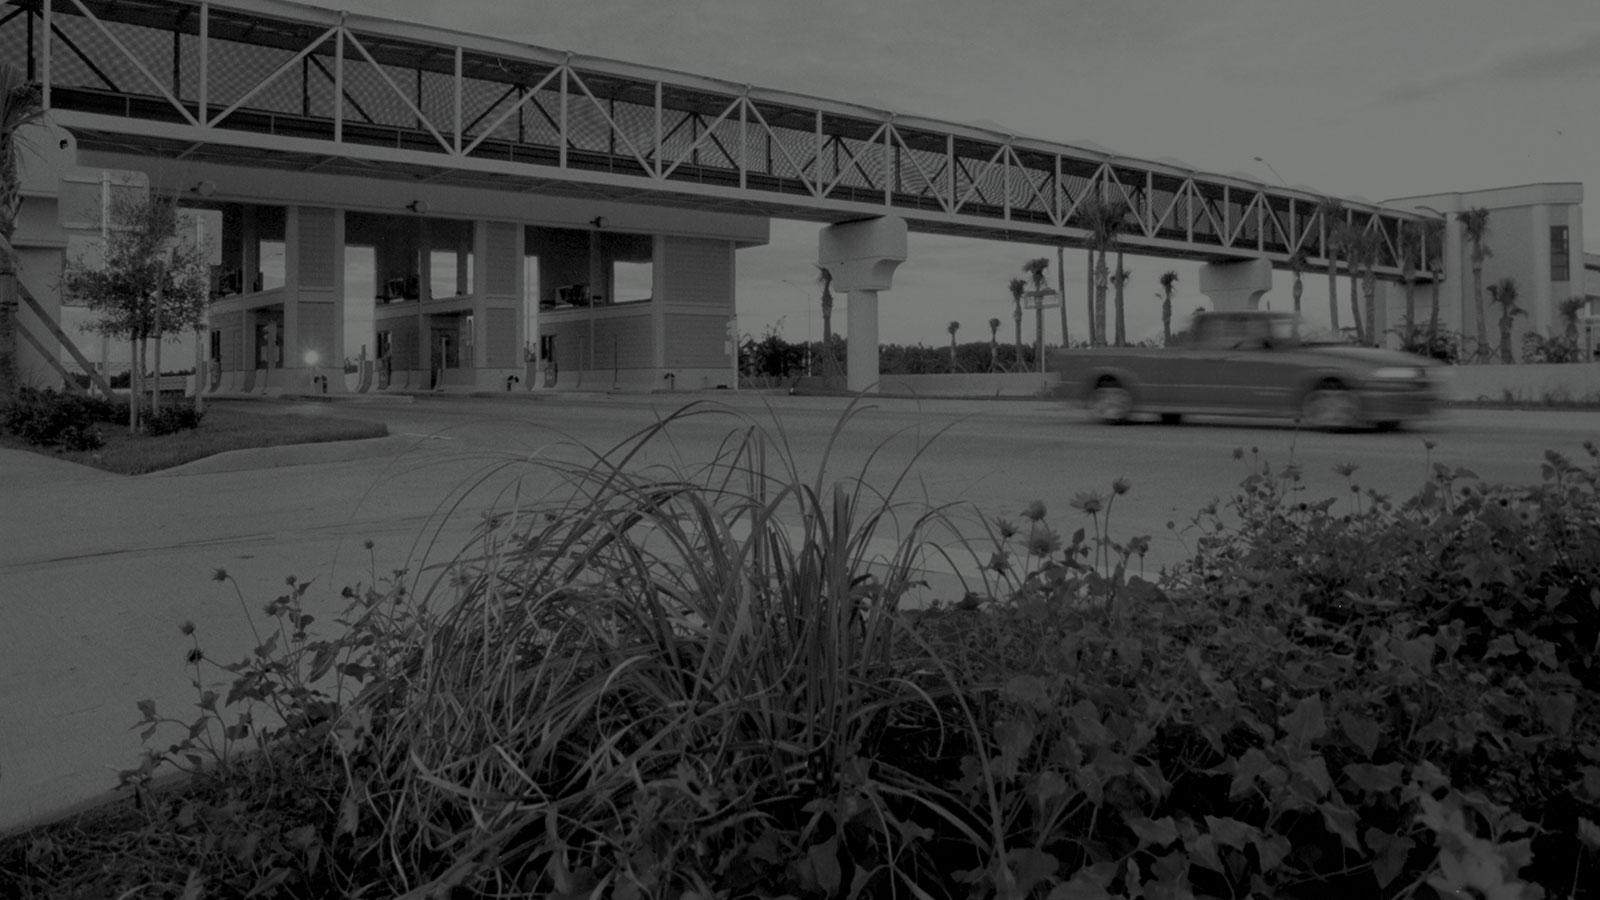 Central Florida Expressway toll plaza